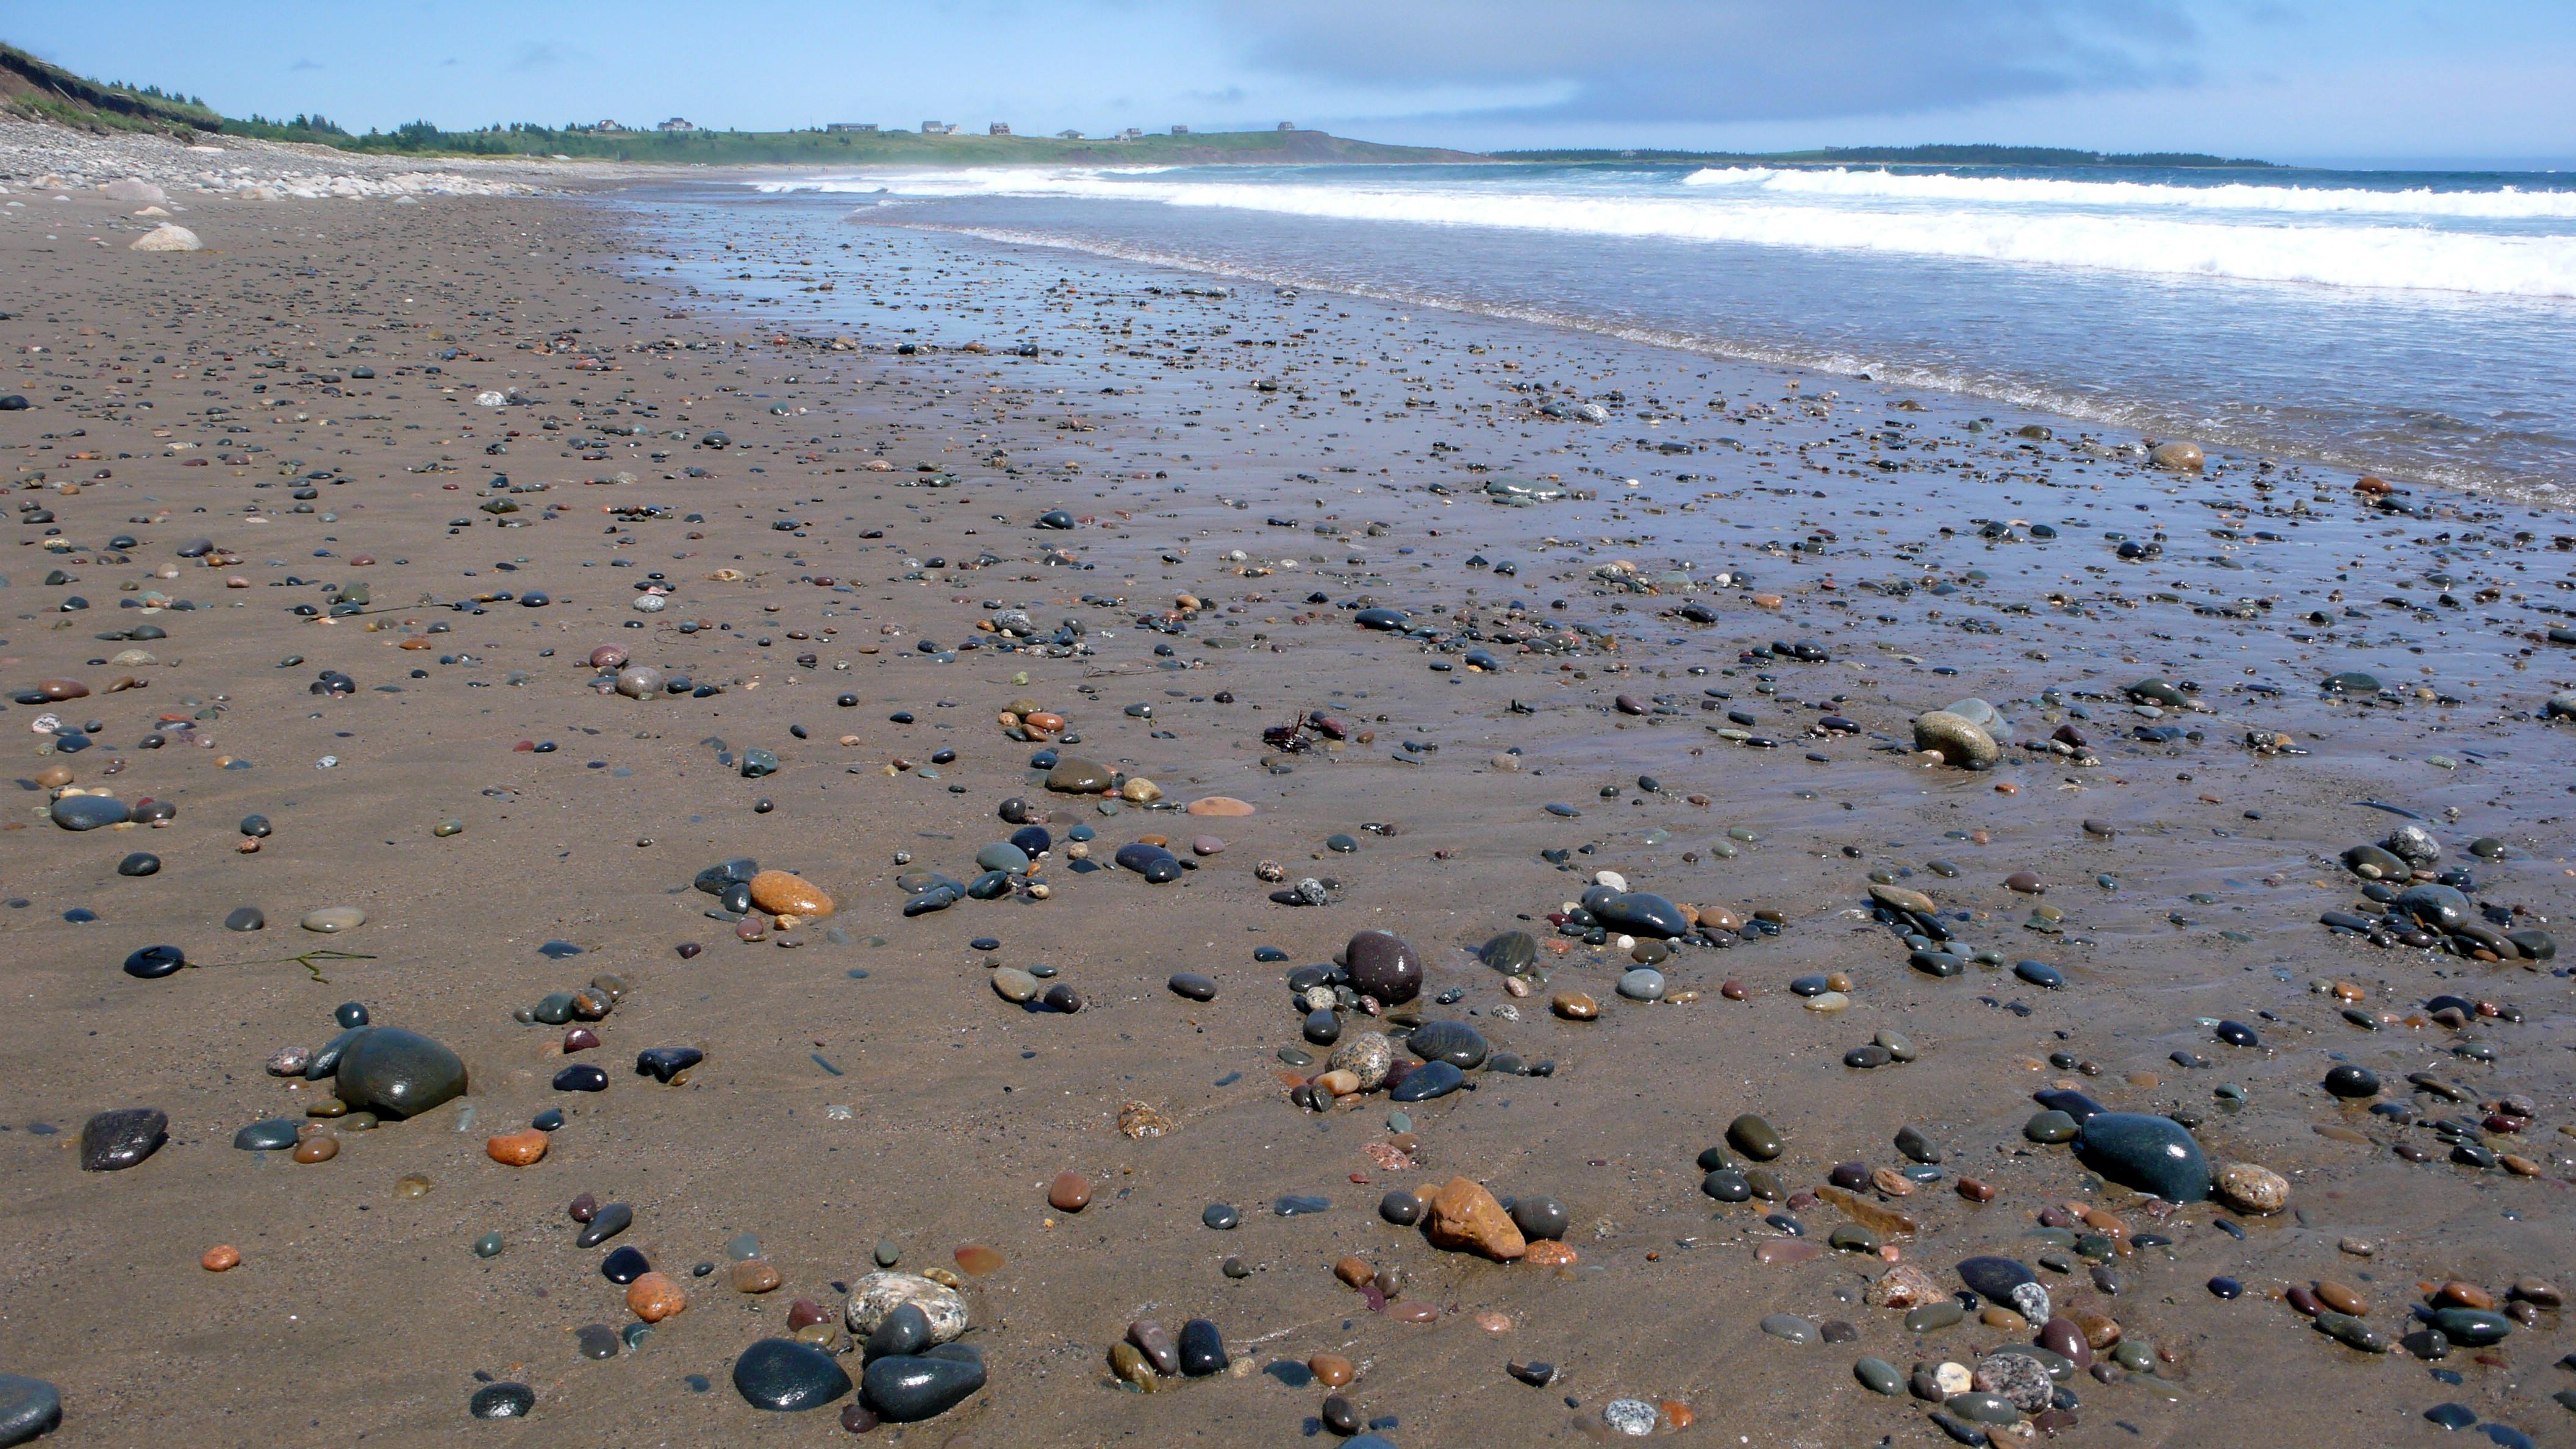 Nute beach photo, gloria trevi and nude